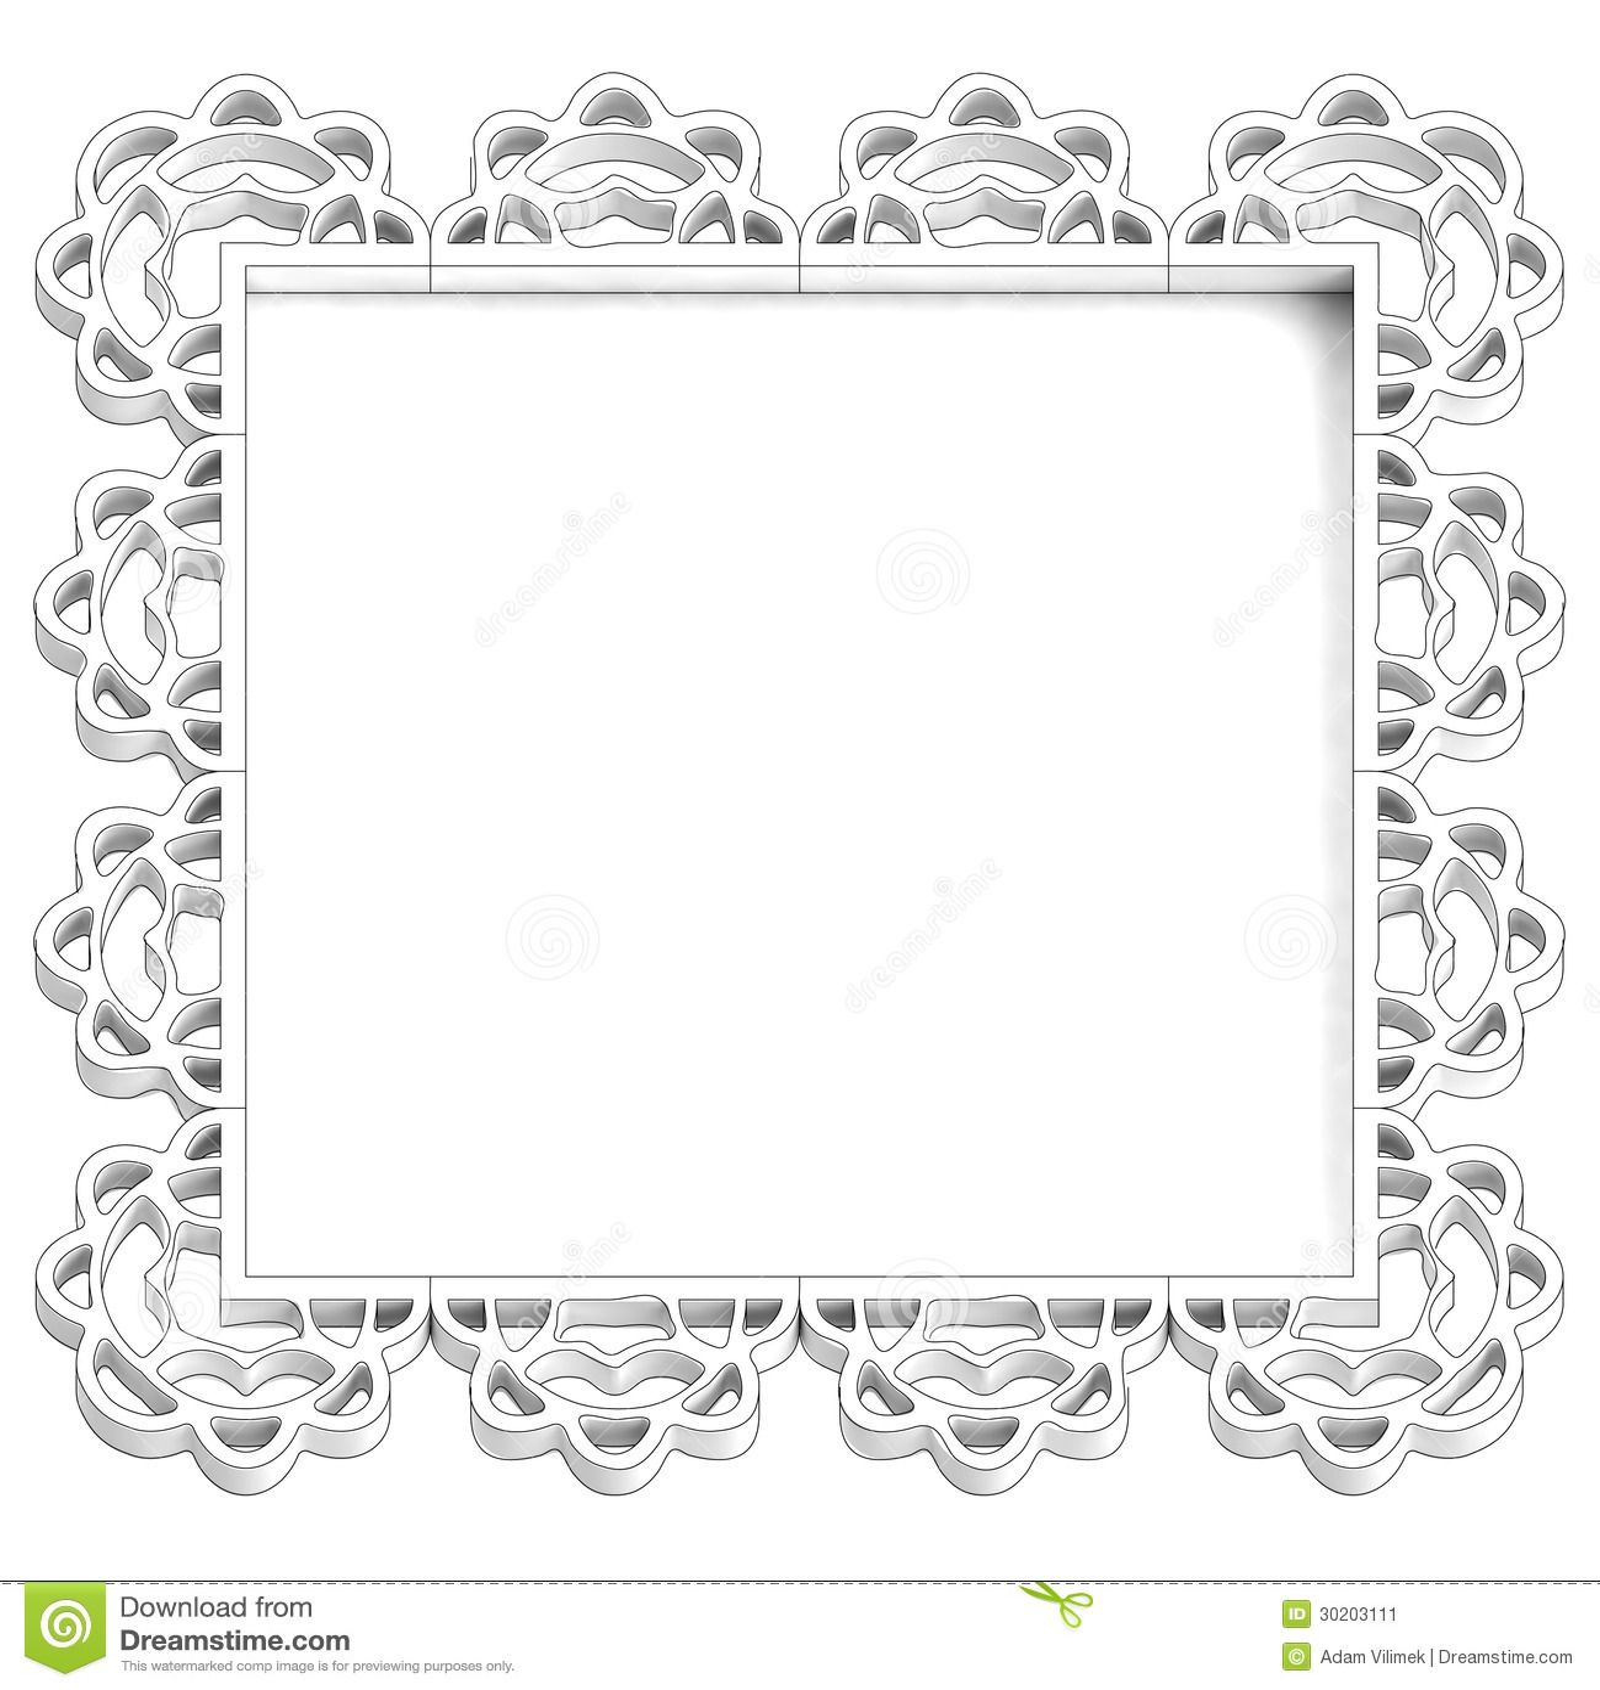 Antique Retro White Frame For Text Stock Image - Image ...